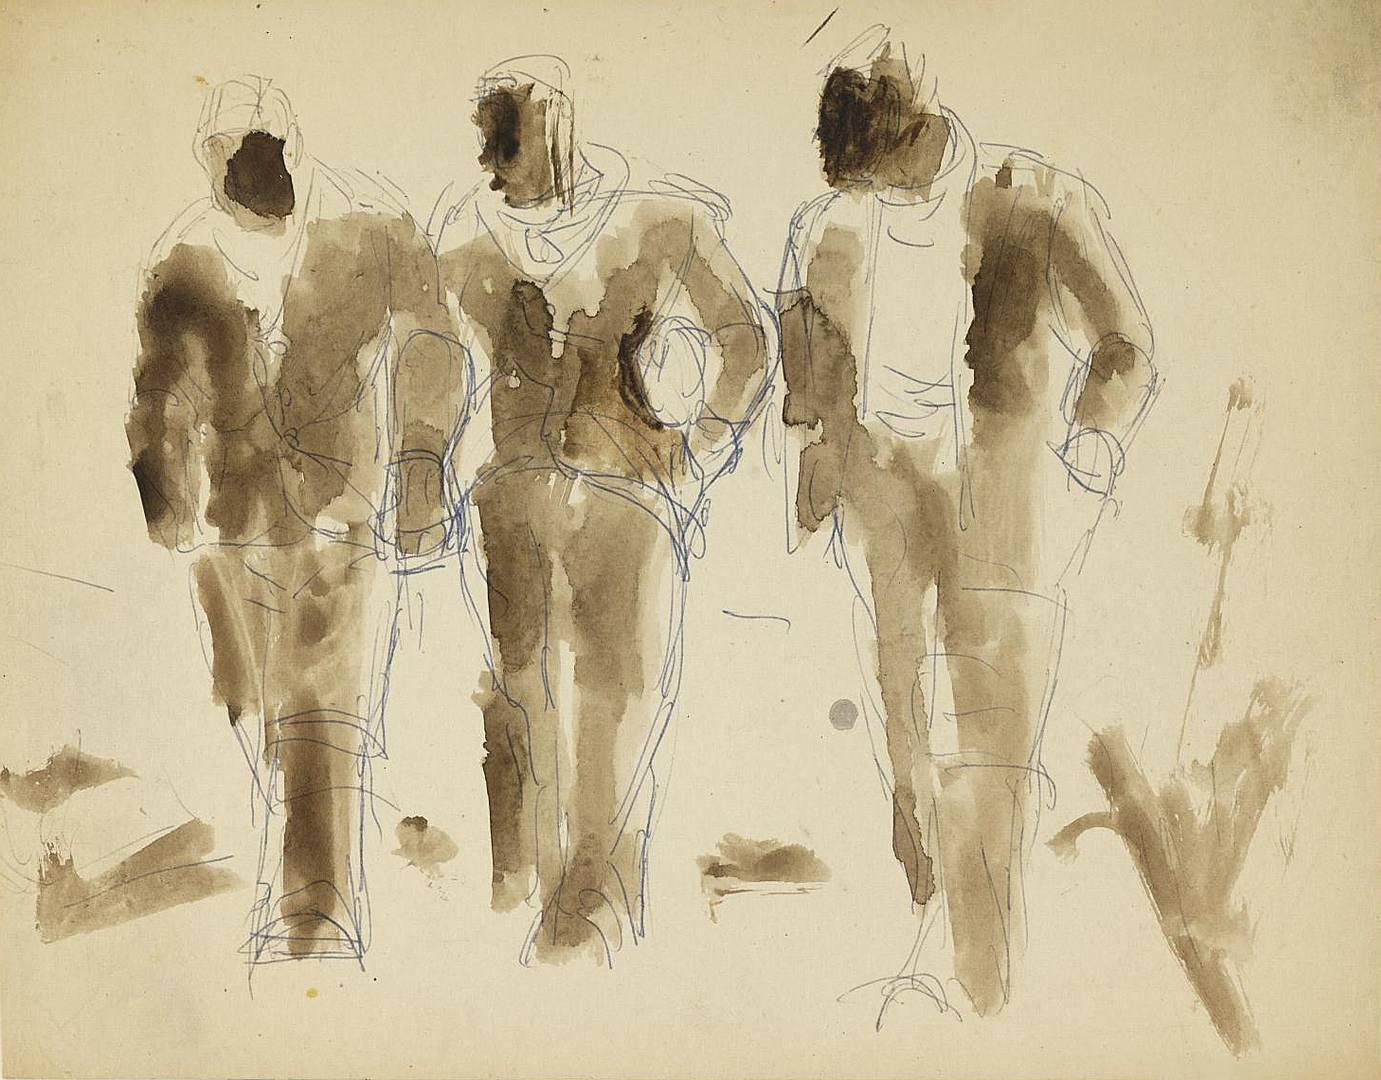 Йозеф Герман. Три шахтера по дороге домой. Эскиз. 1954–1955